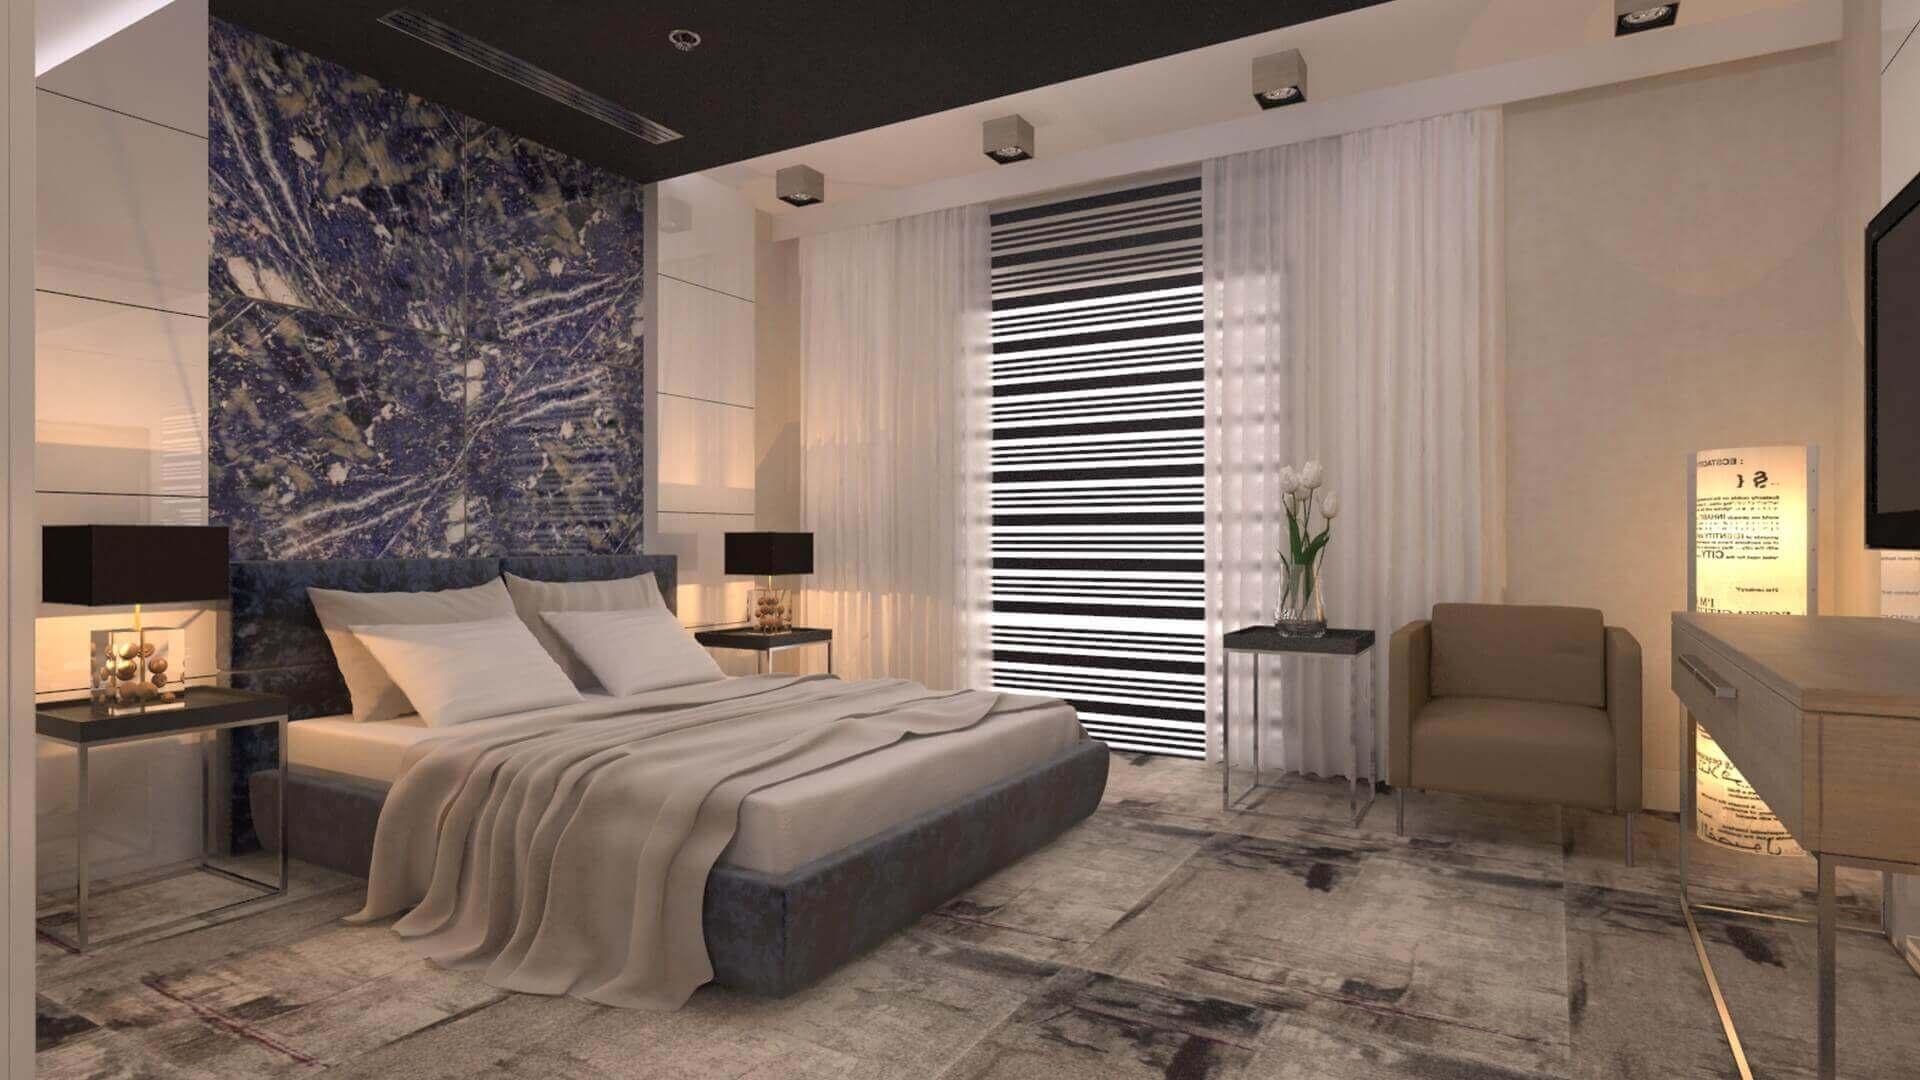 ankara otel mimar 2138 Doğu Hotel, Tahran Oteller